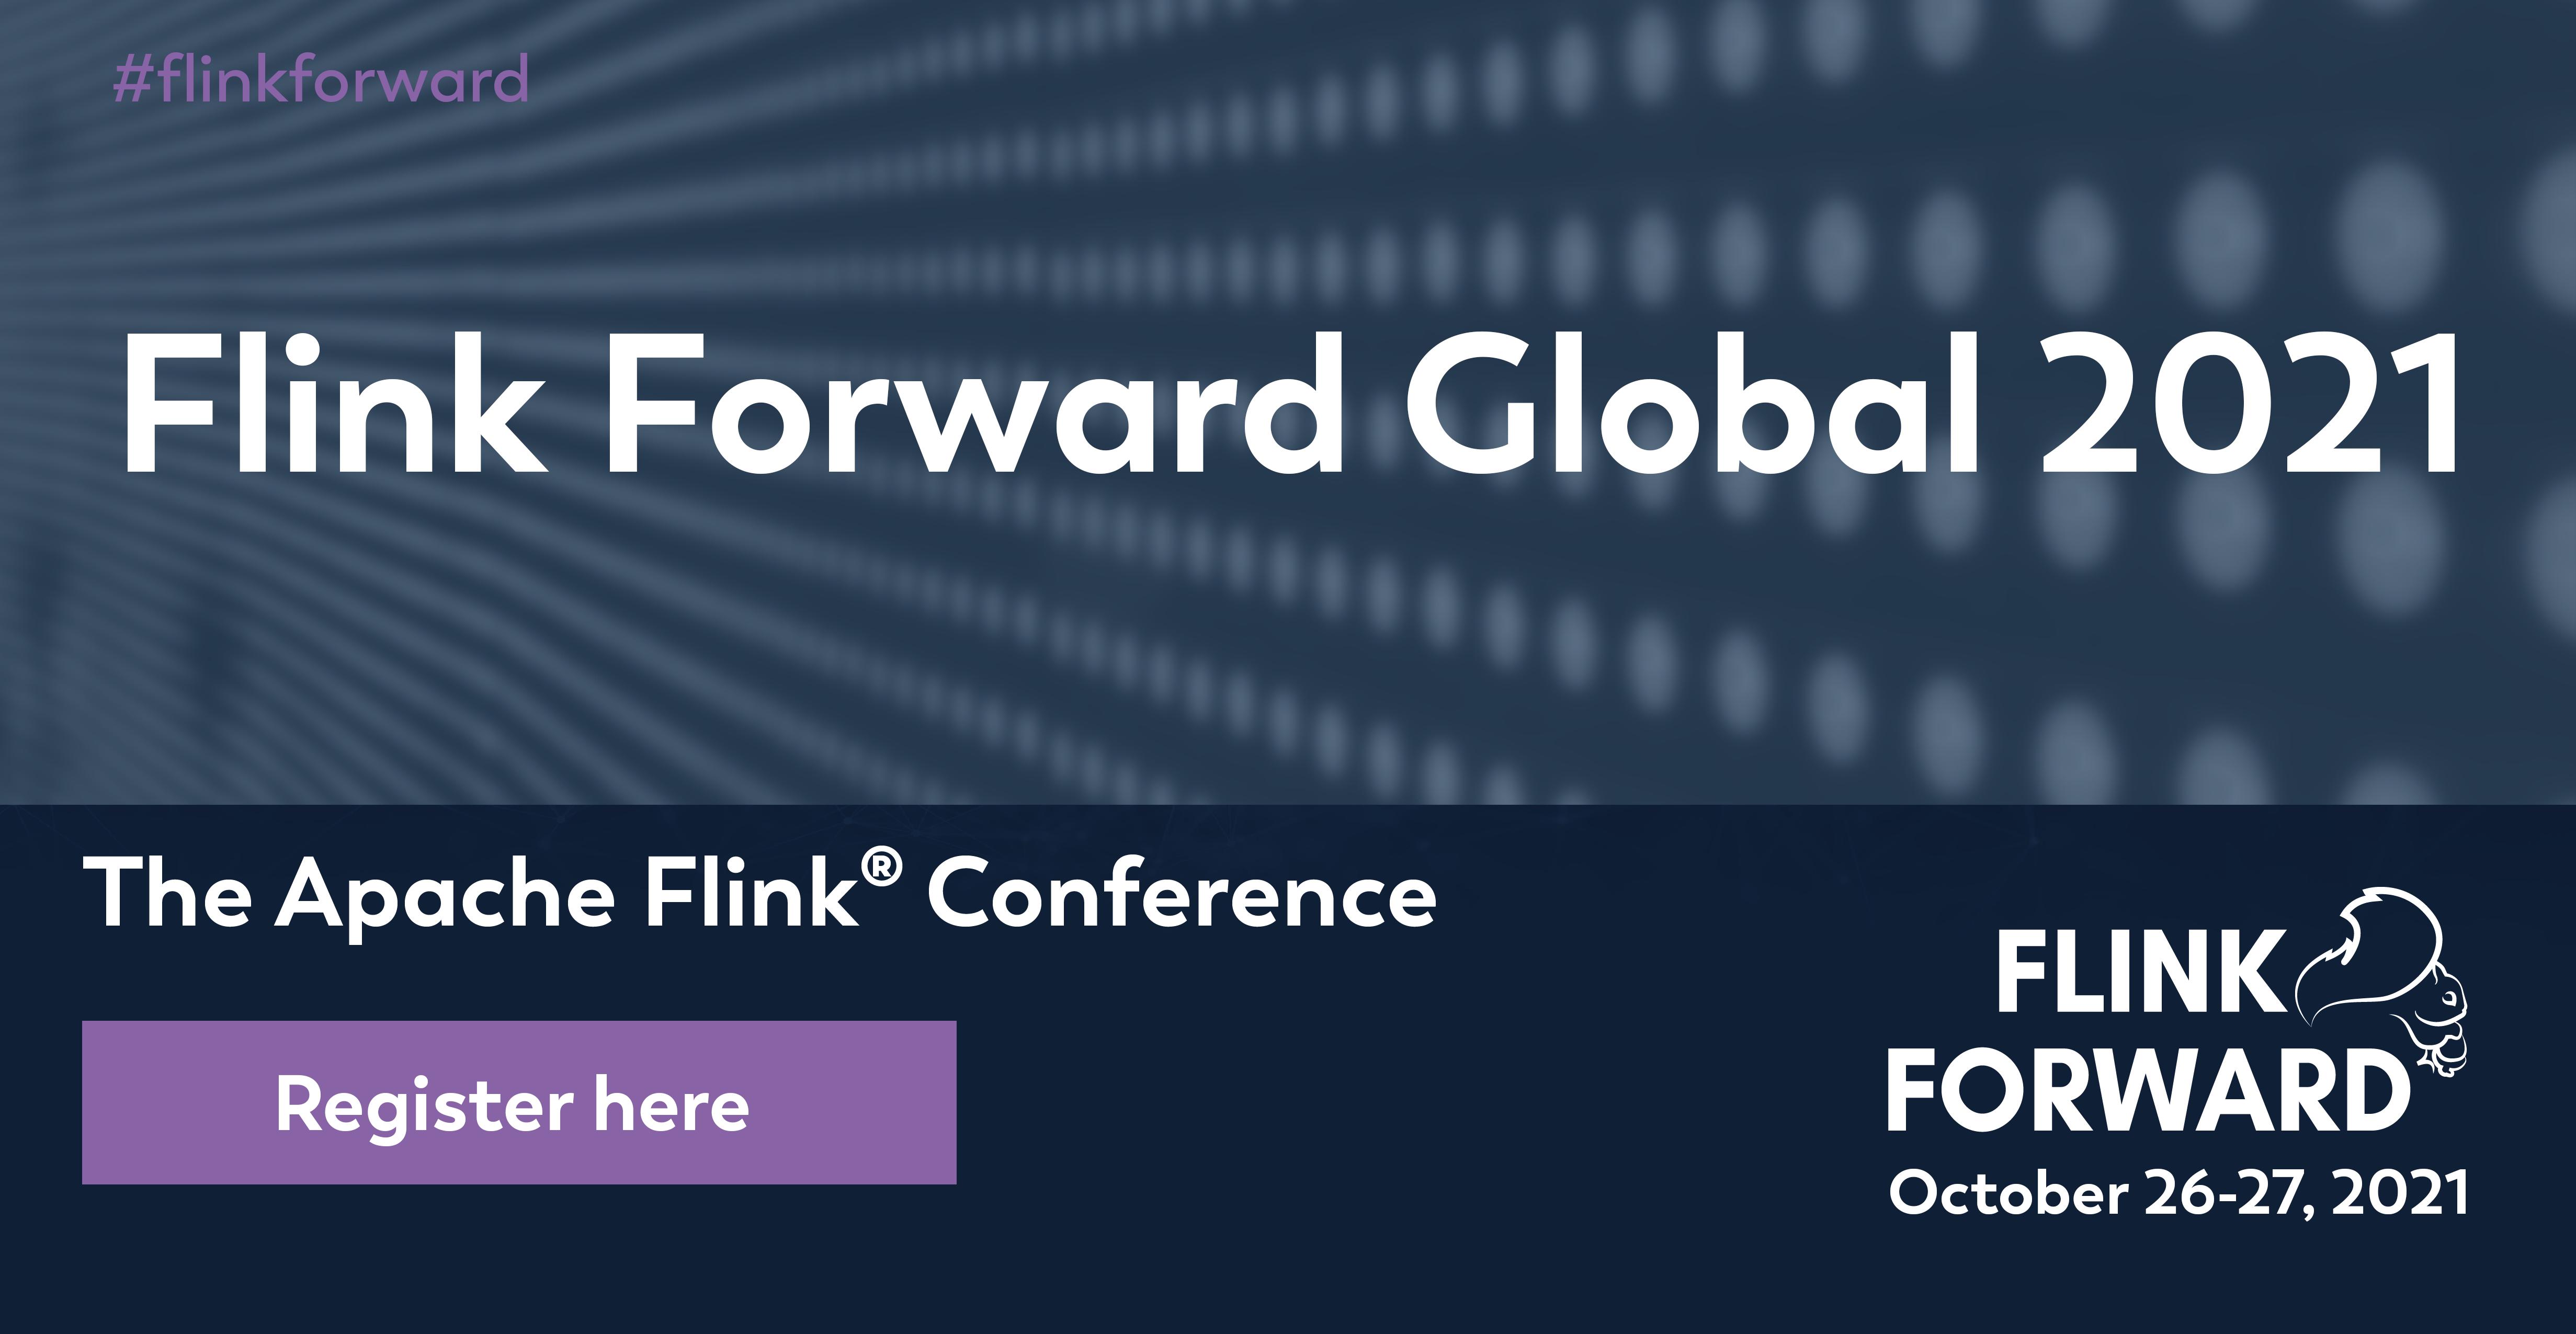 Flink Forward GLobal 2021